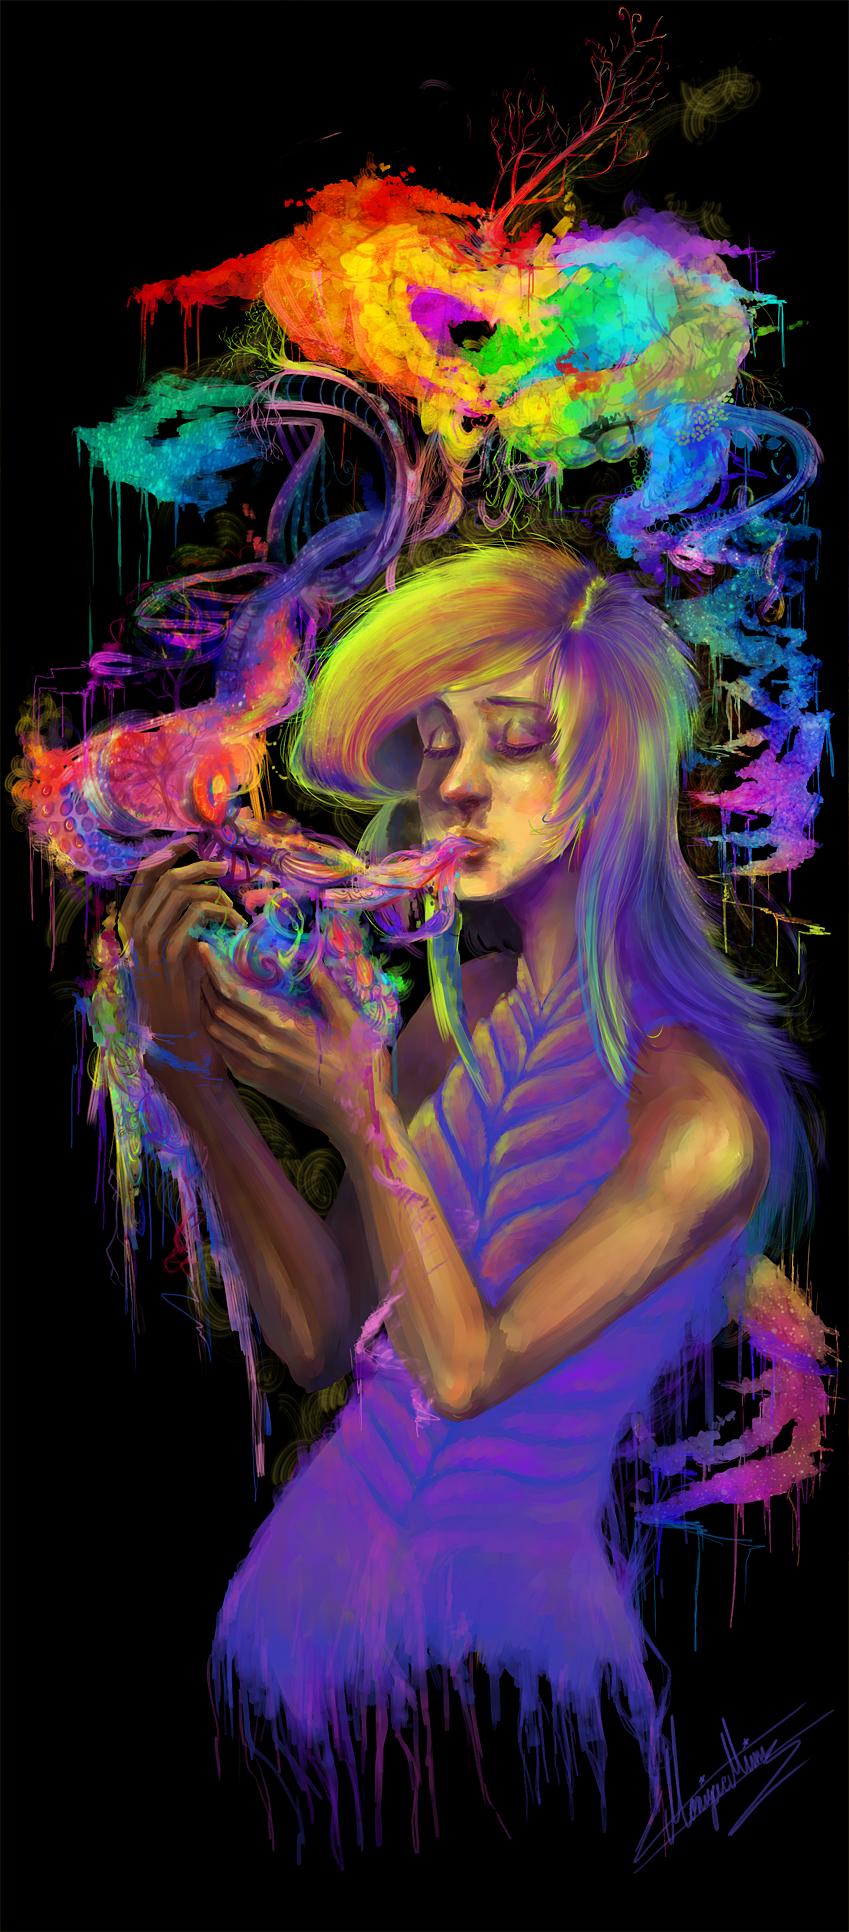 Take My Breath Away by kaiser-mony